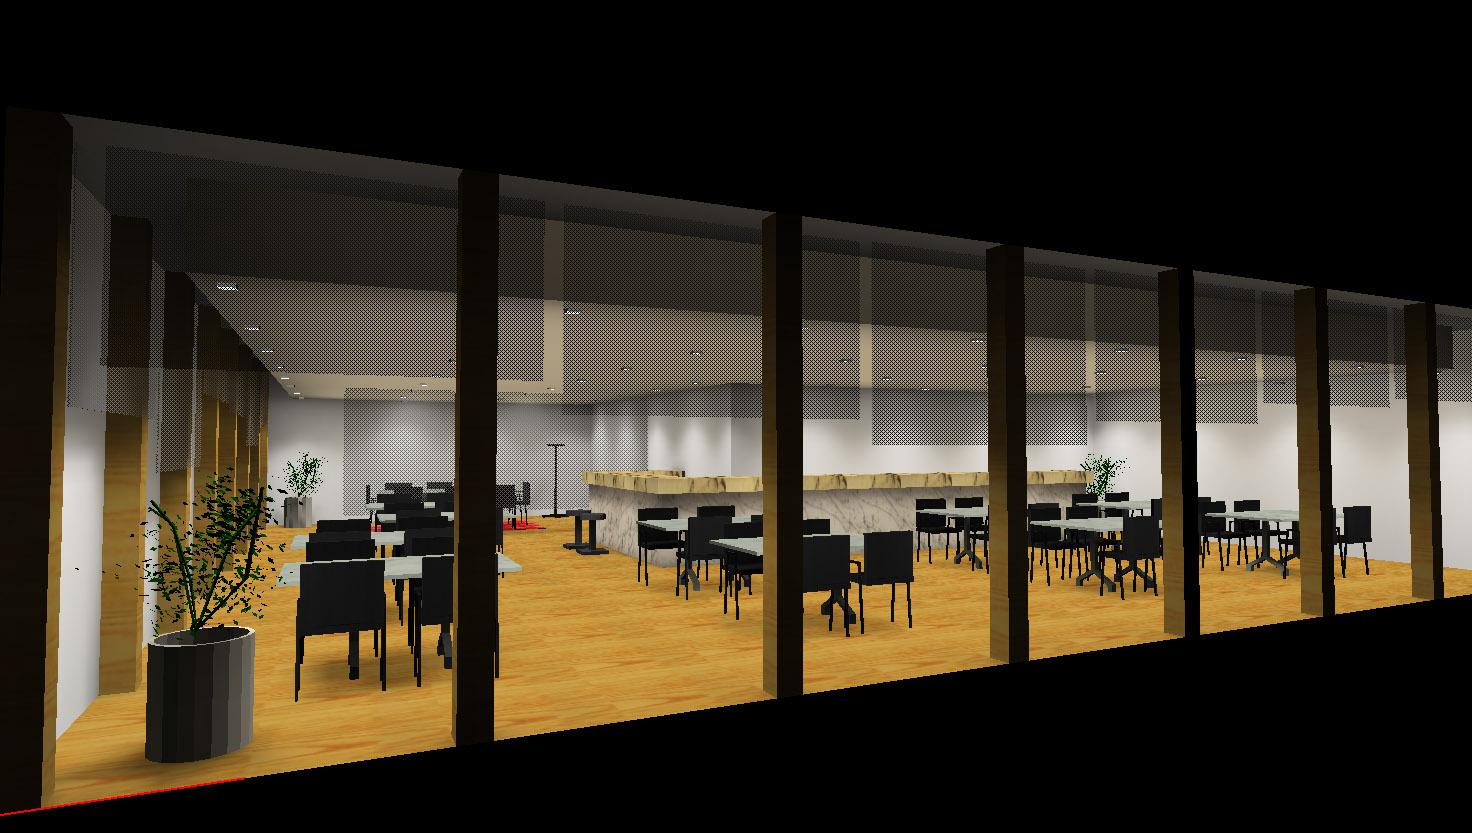 Asesor a proyectos luminot cnicos interior exterior - Sistemas de iluminacion interior ...